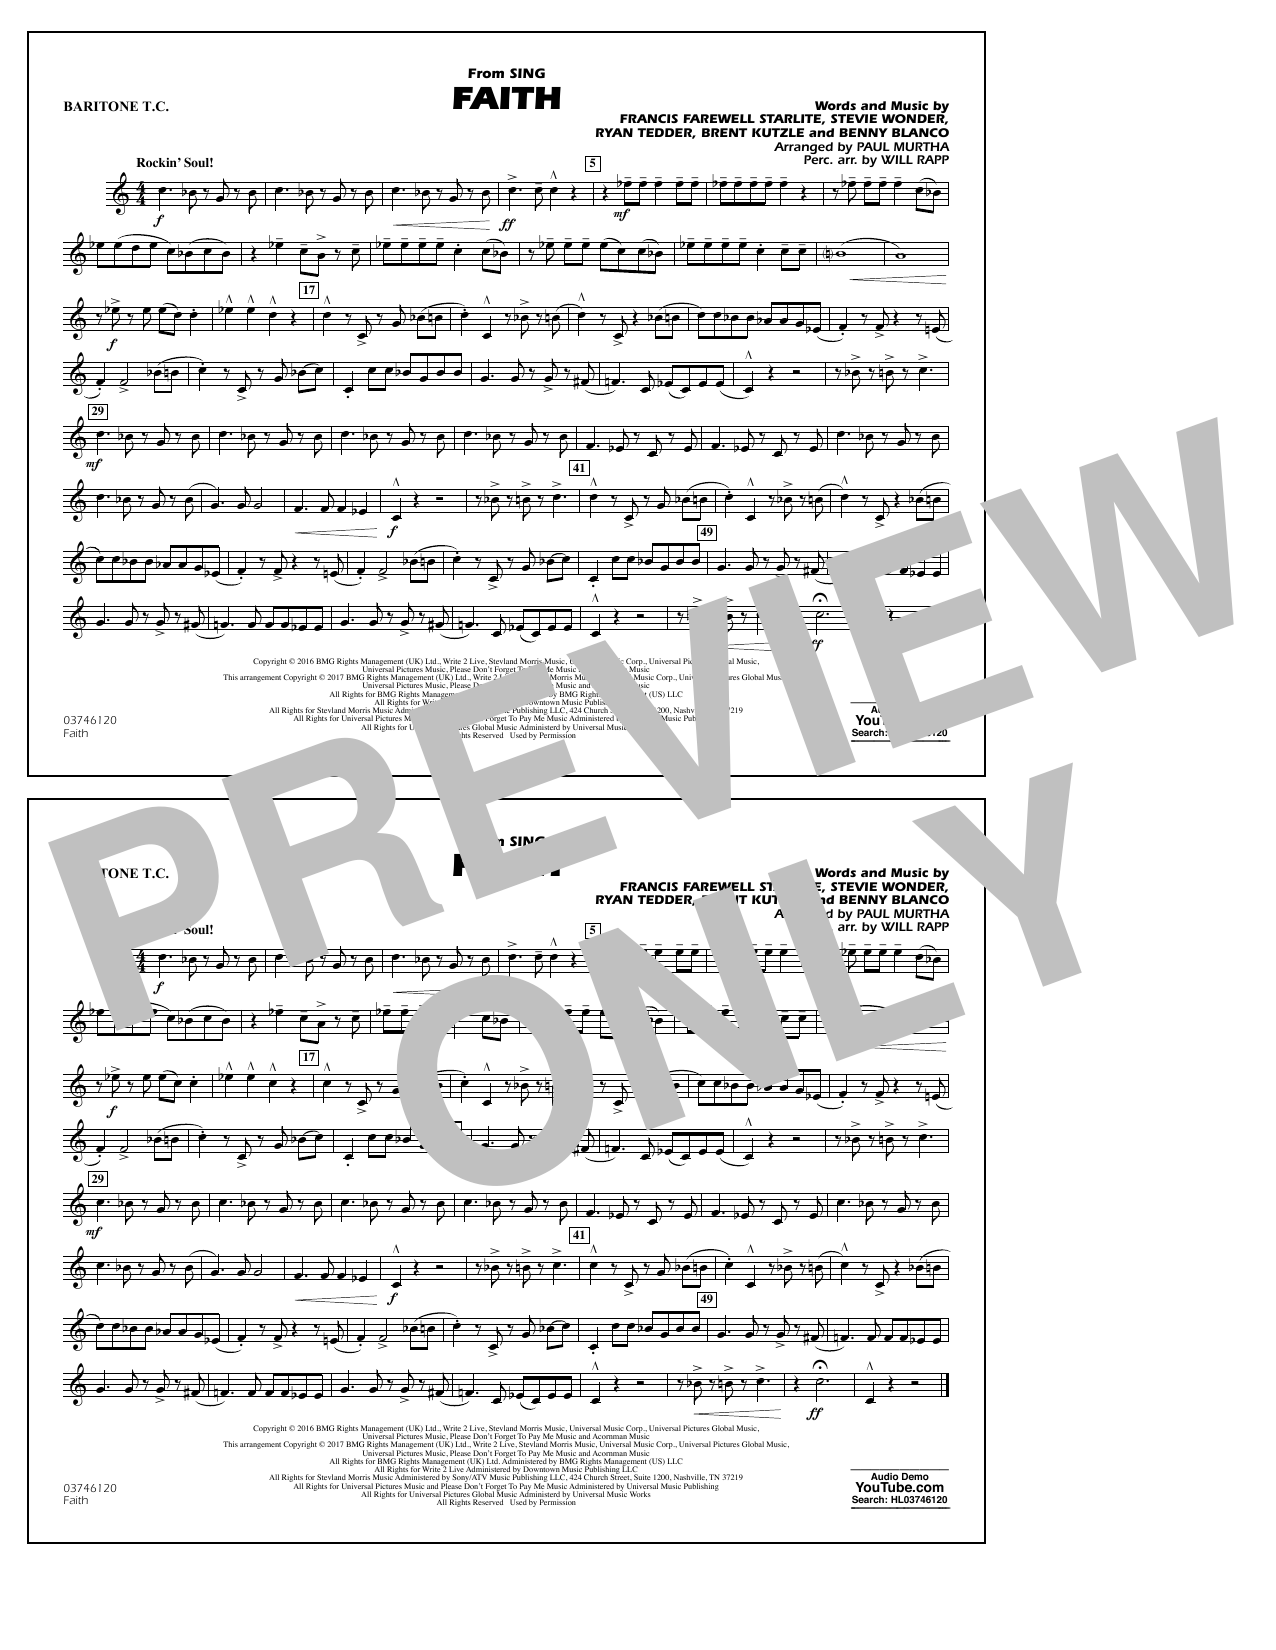 Faith (from Sing) - Baritone T.C. Sheet Music